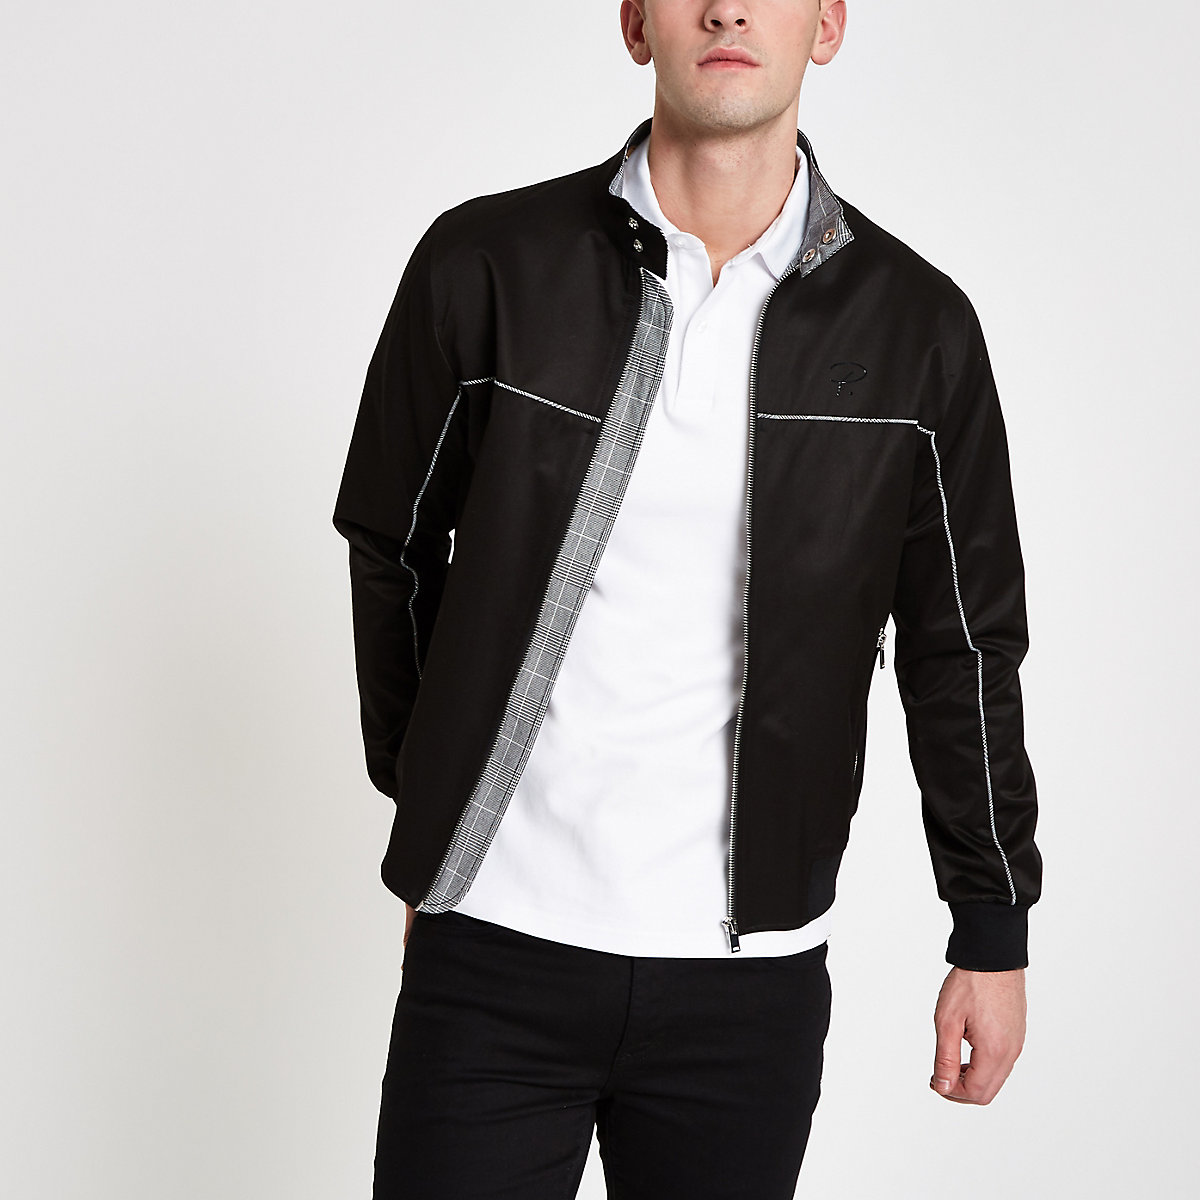 Black 'Prolific' Harrington jacket